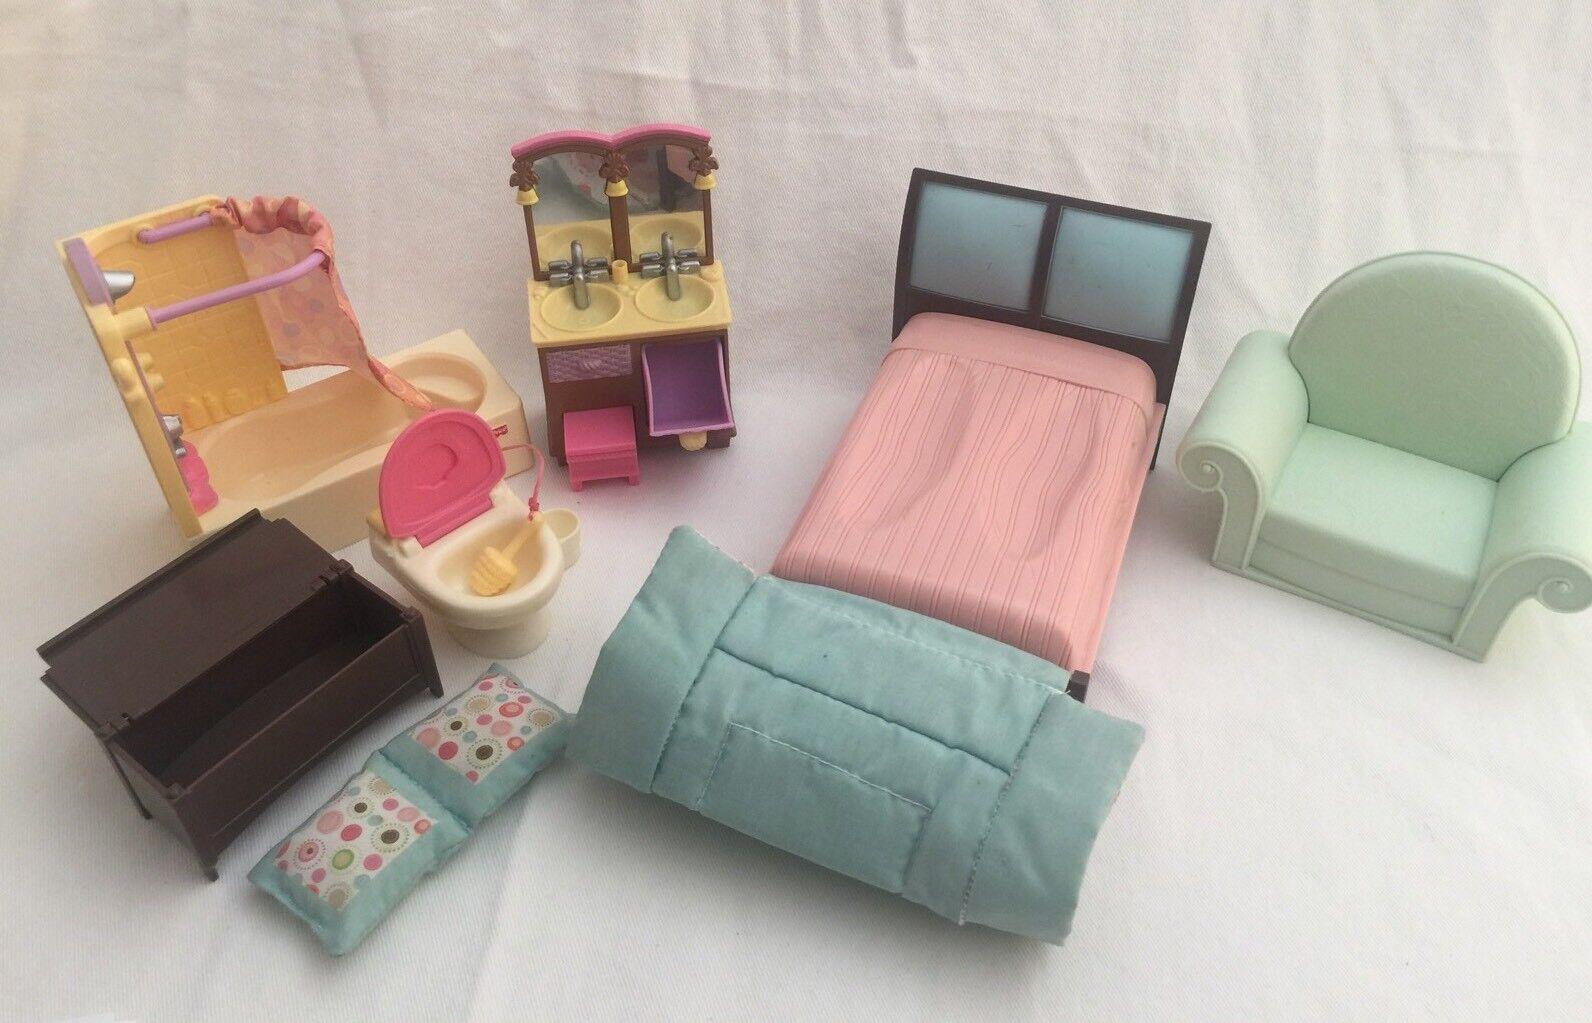 Fisher-Price Loving Family Family Family MASTER BEDROOM Dollhouse Furniture 86aae8